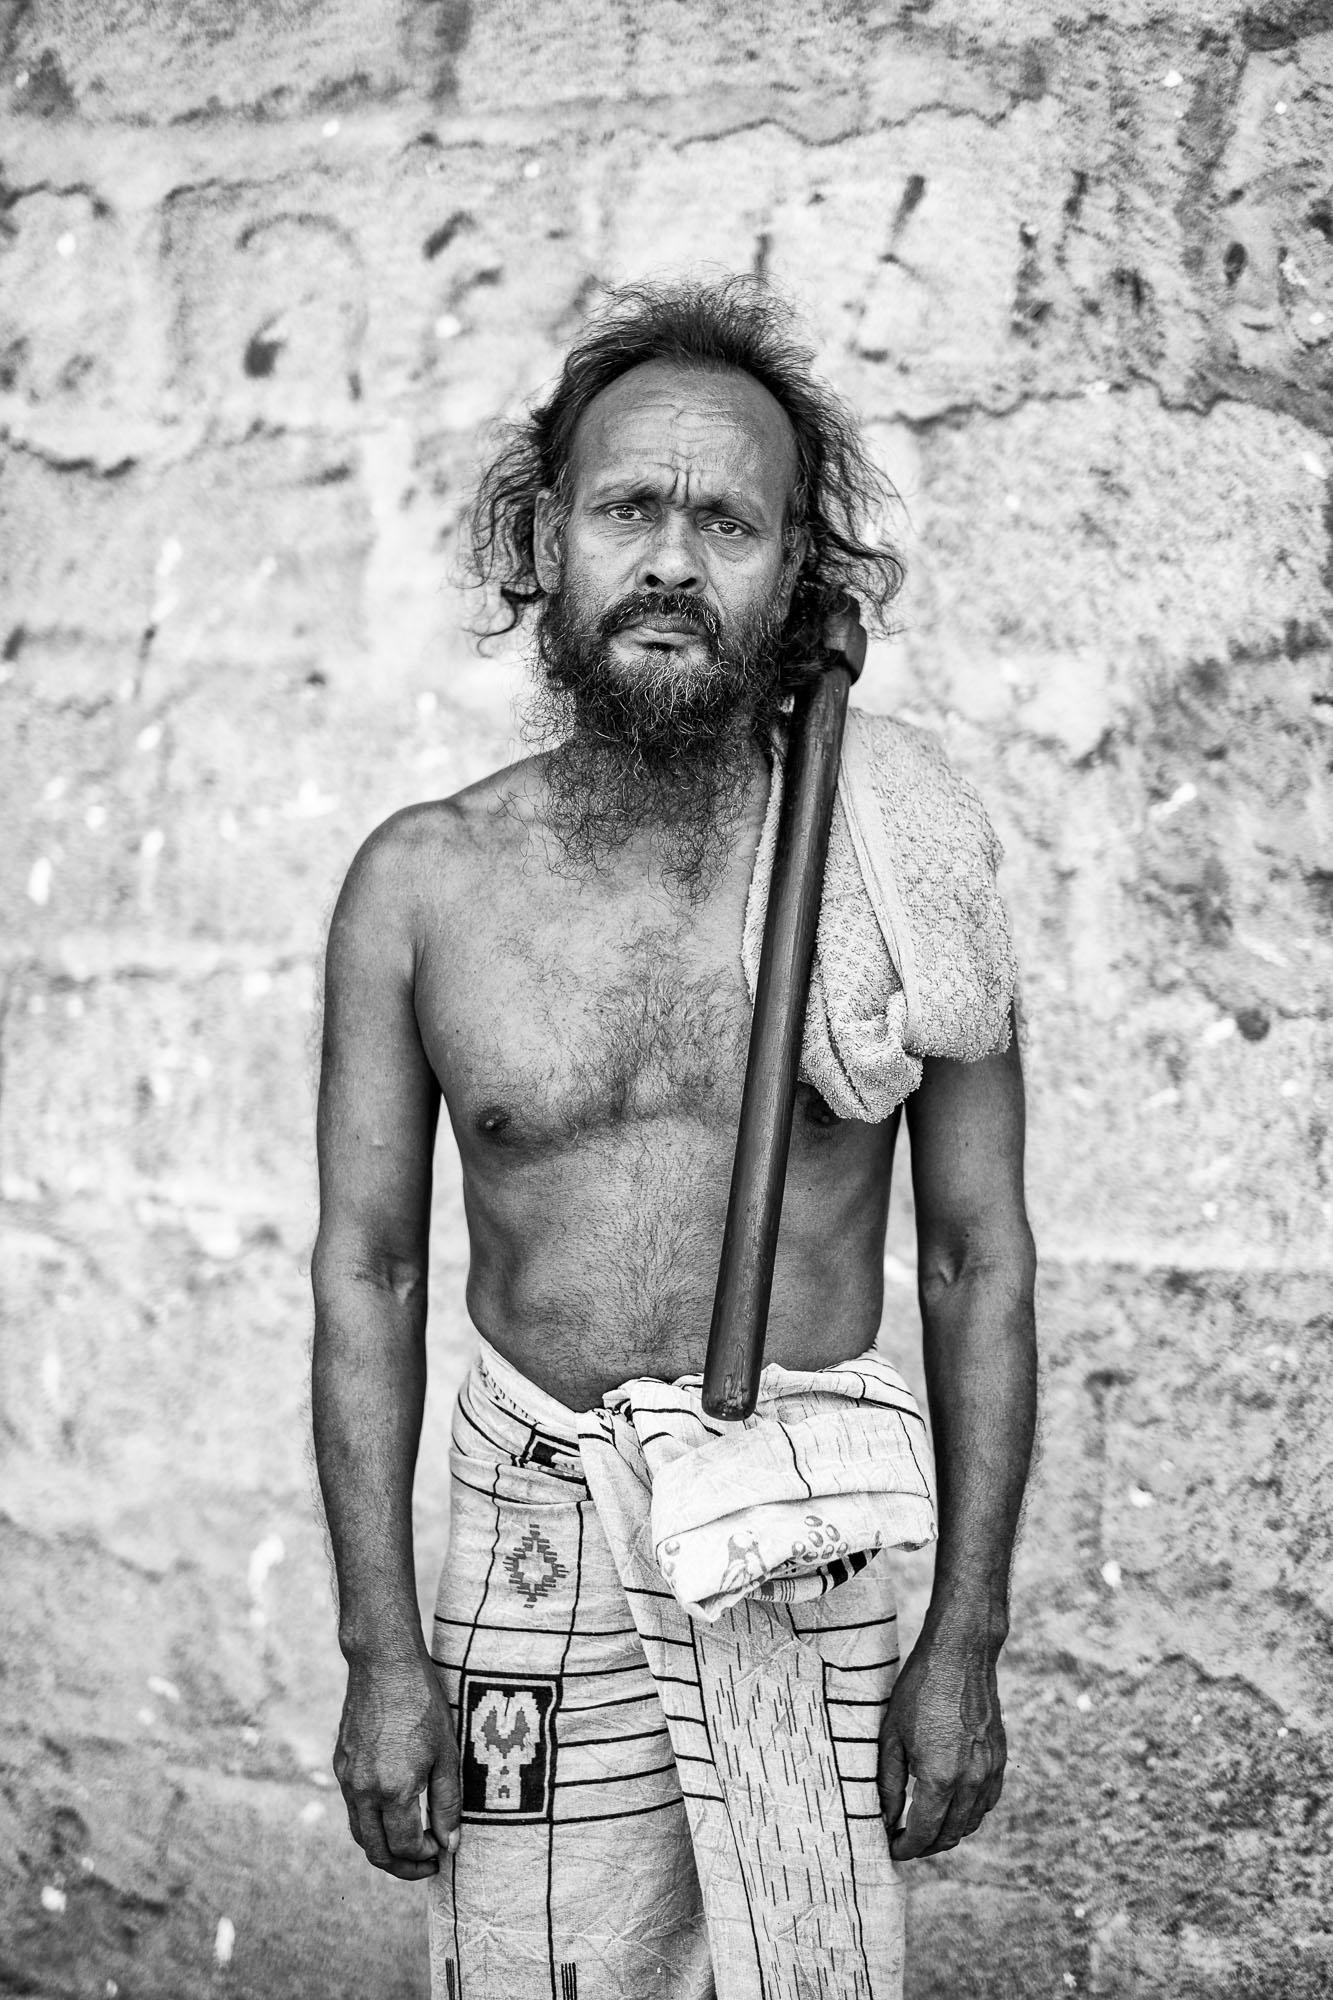 Vadda sri lanka indingenous group people photography - veddas chef tribe